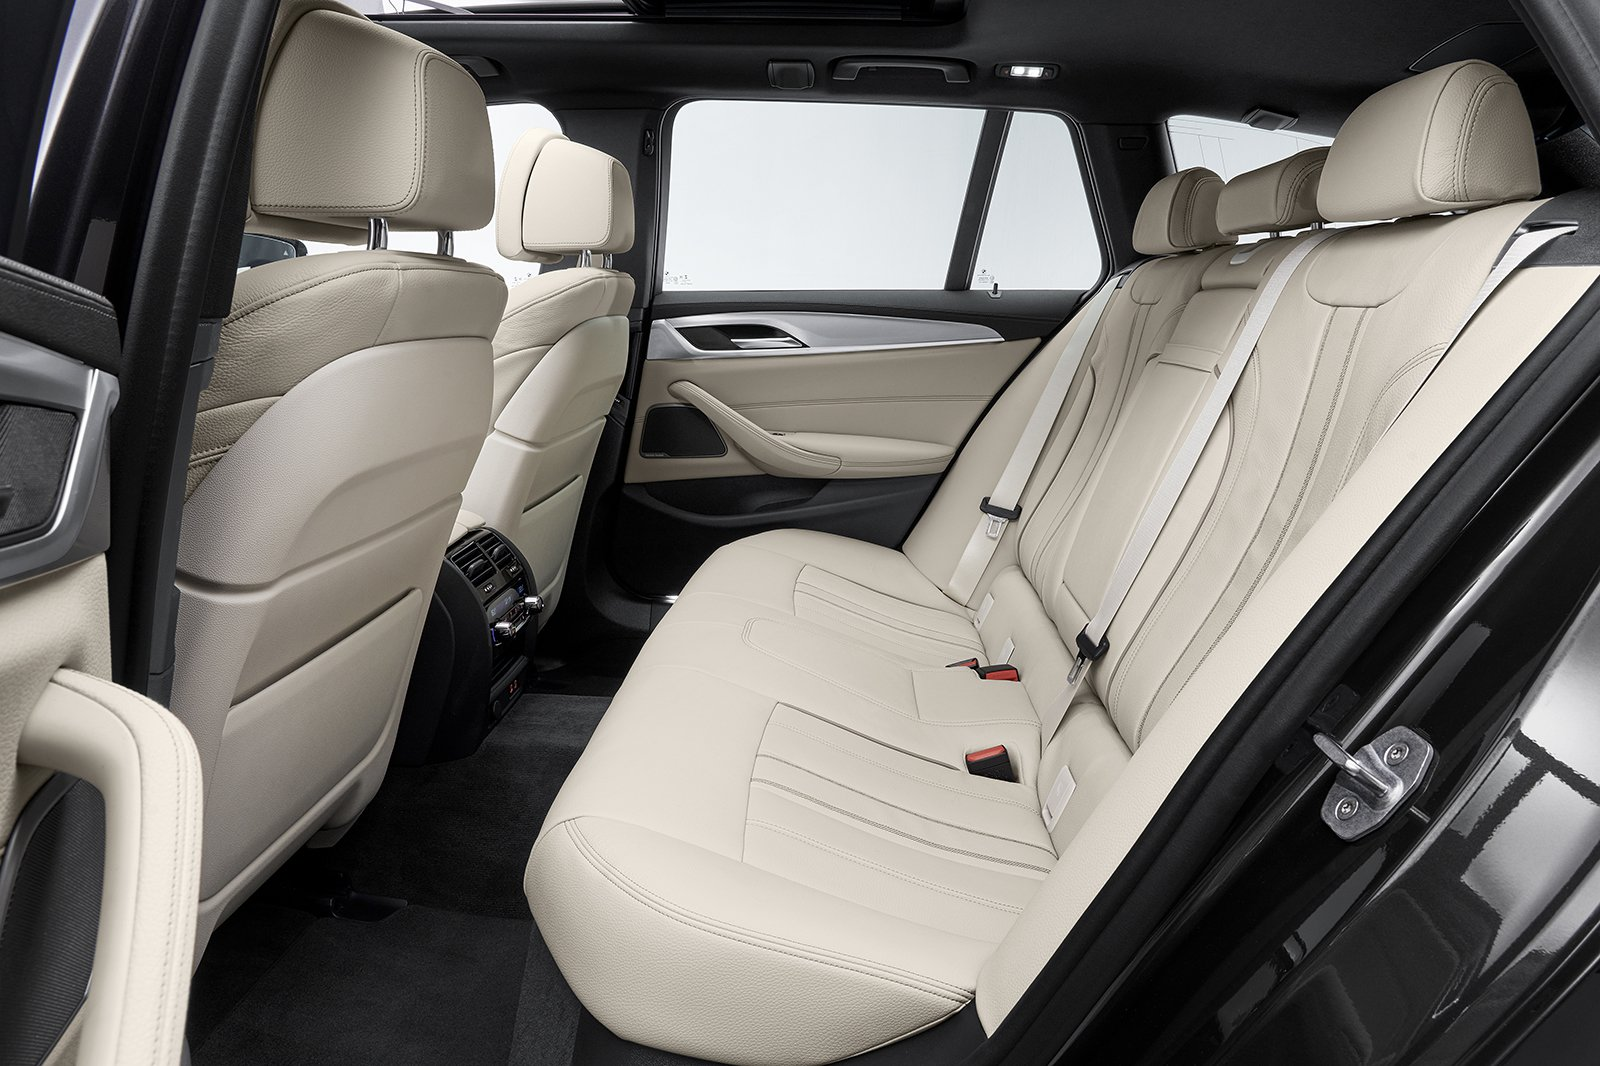 BMW 5 Series Touring 2020 rear seats